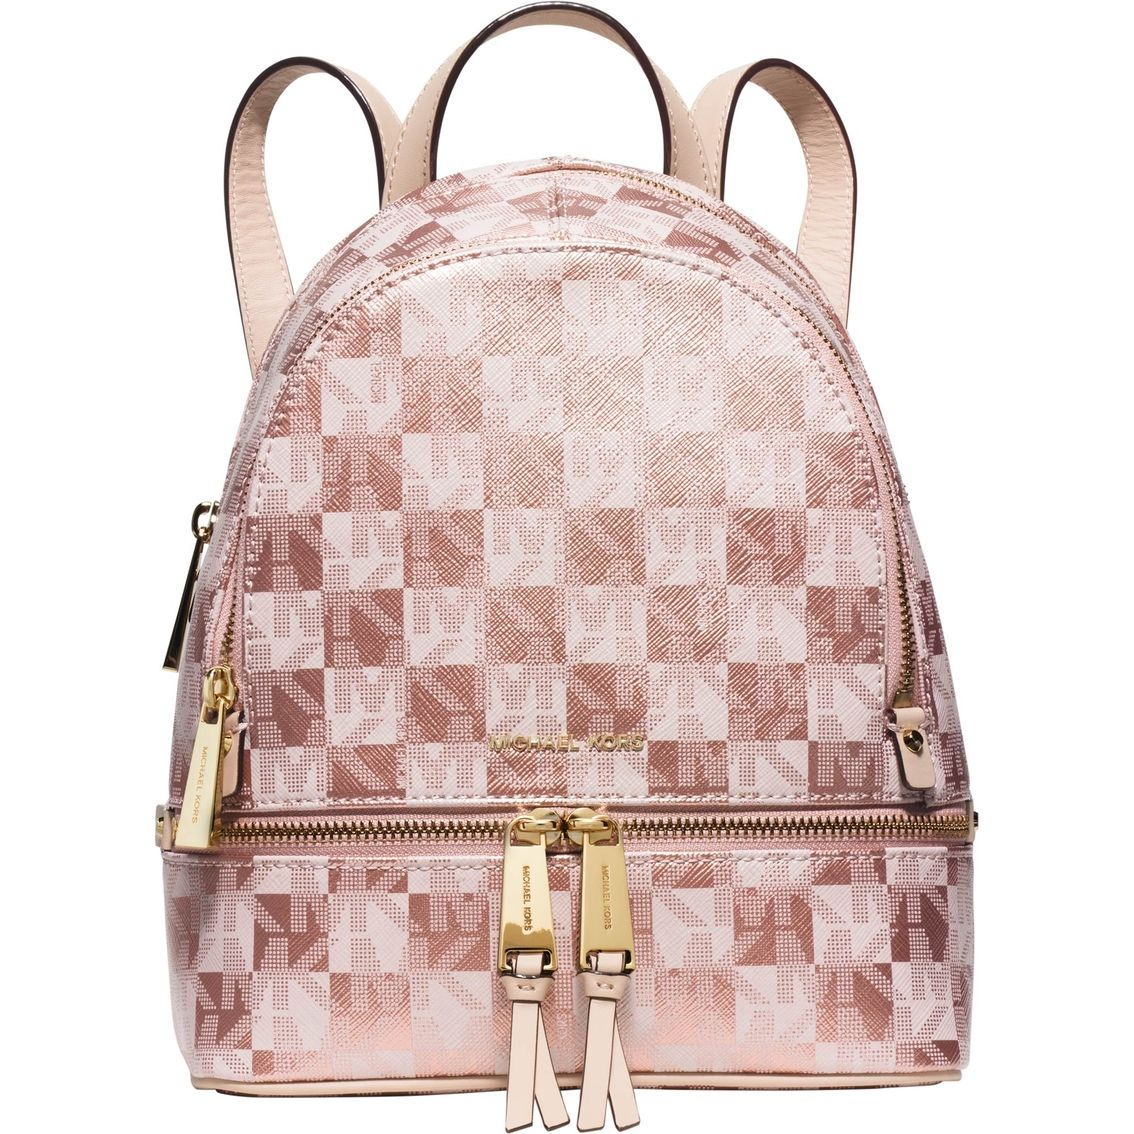 6984eef358 Keep your belongings organized with the trendy Michael Kors Backpack ...